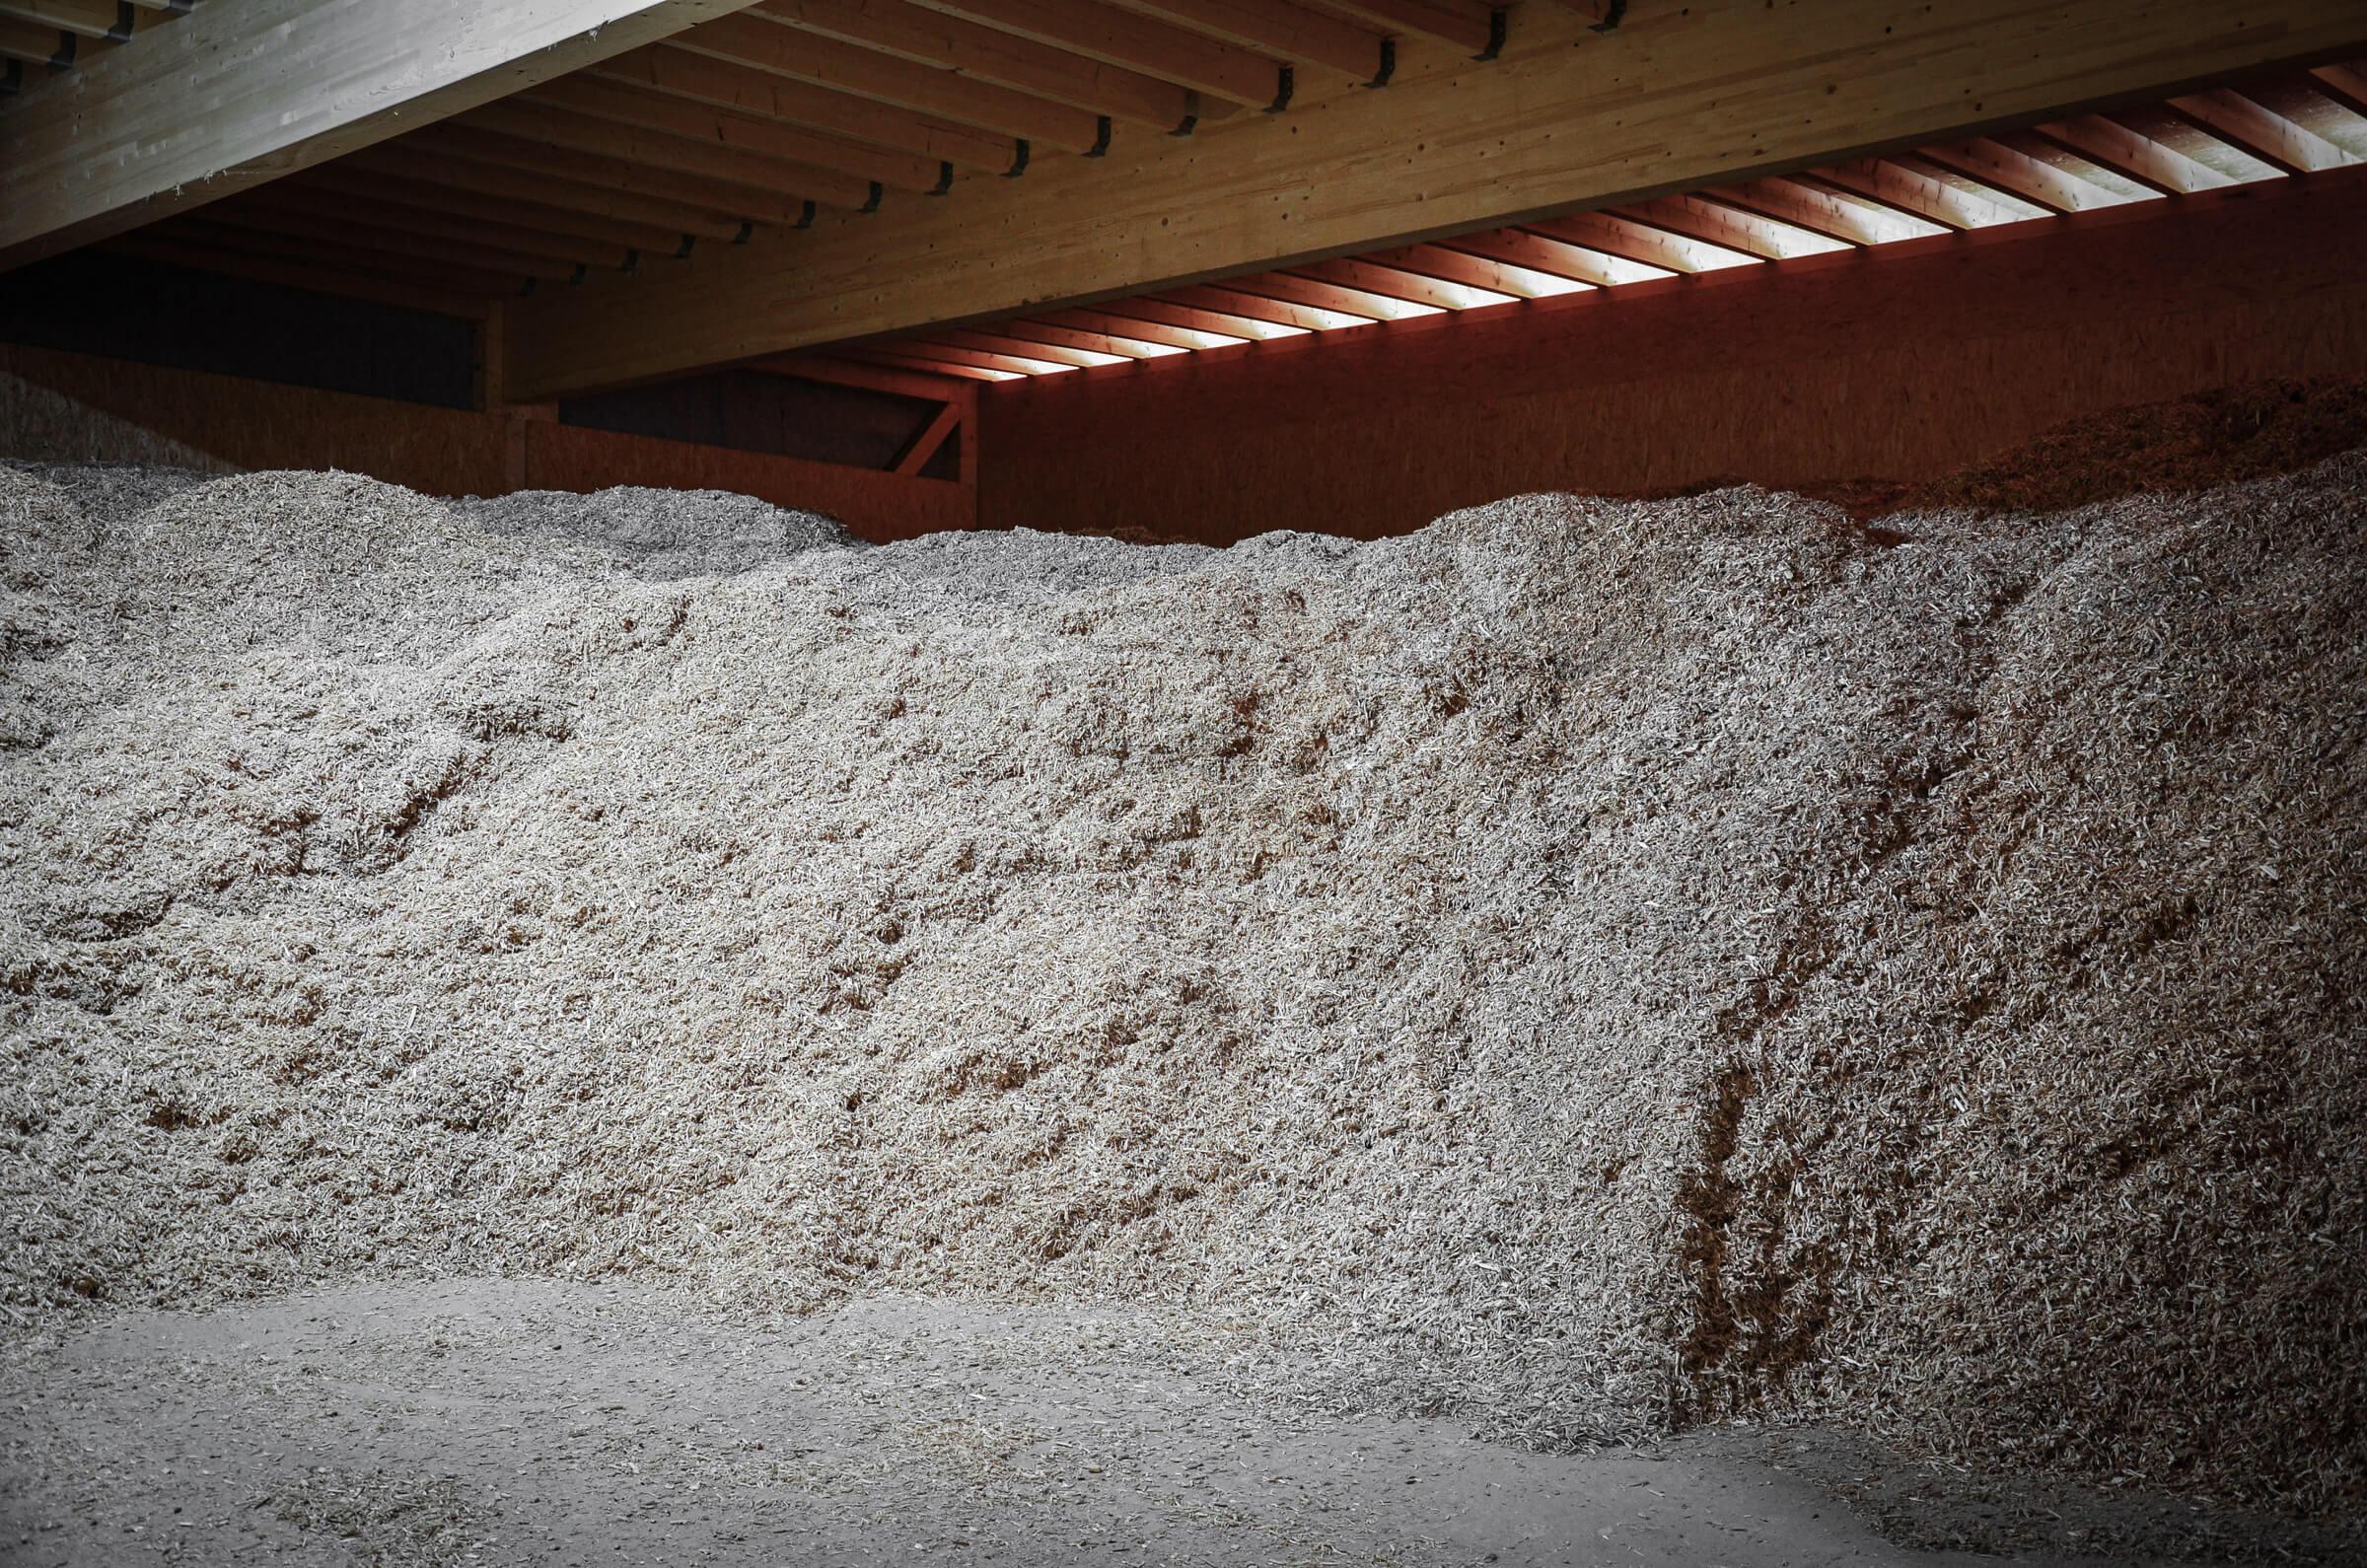 Chip bunker with shredded pallets